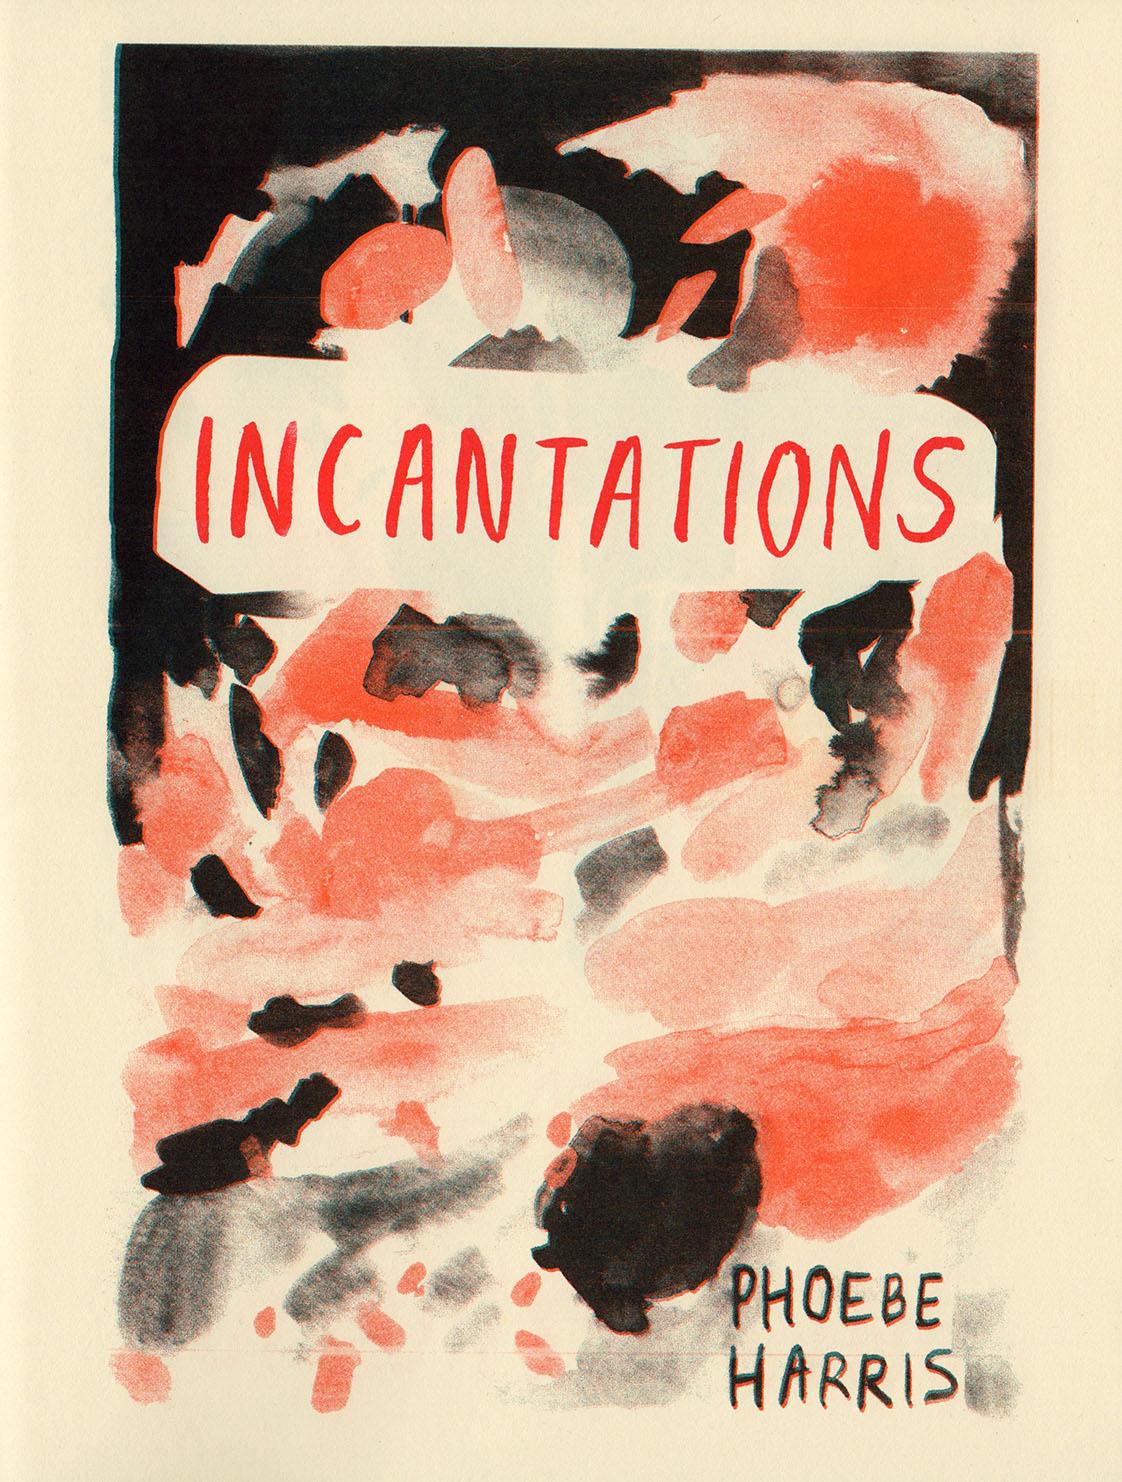 INCANTATIONS_3.jpg